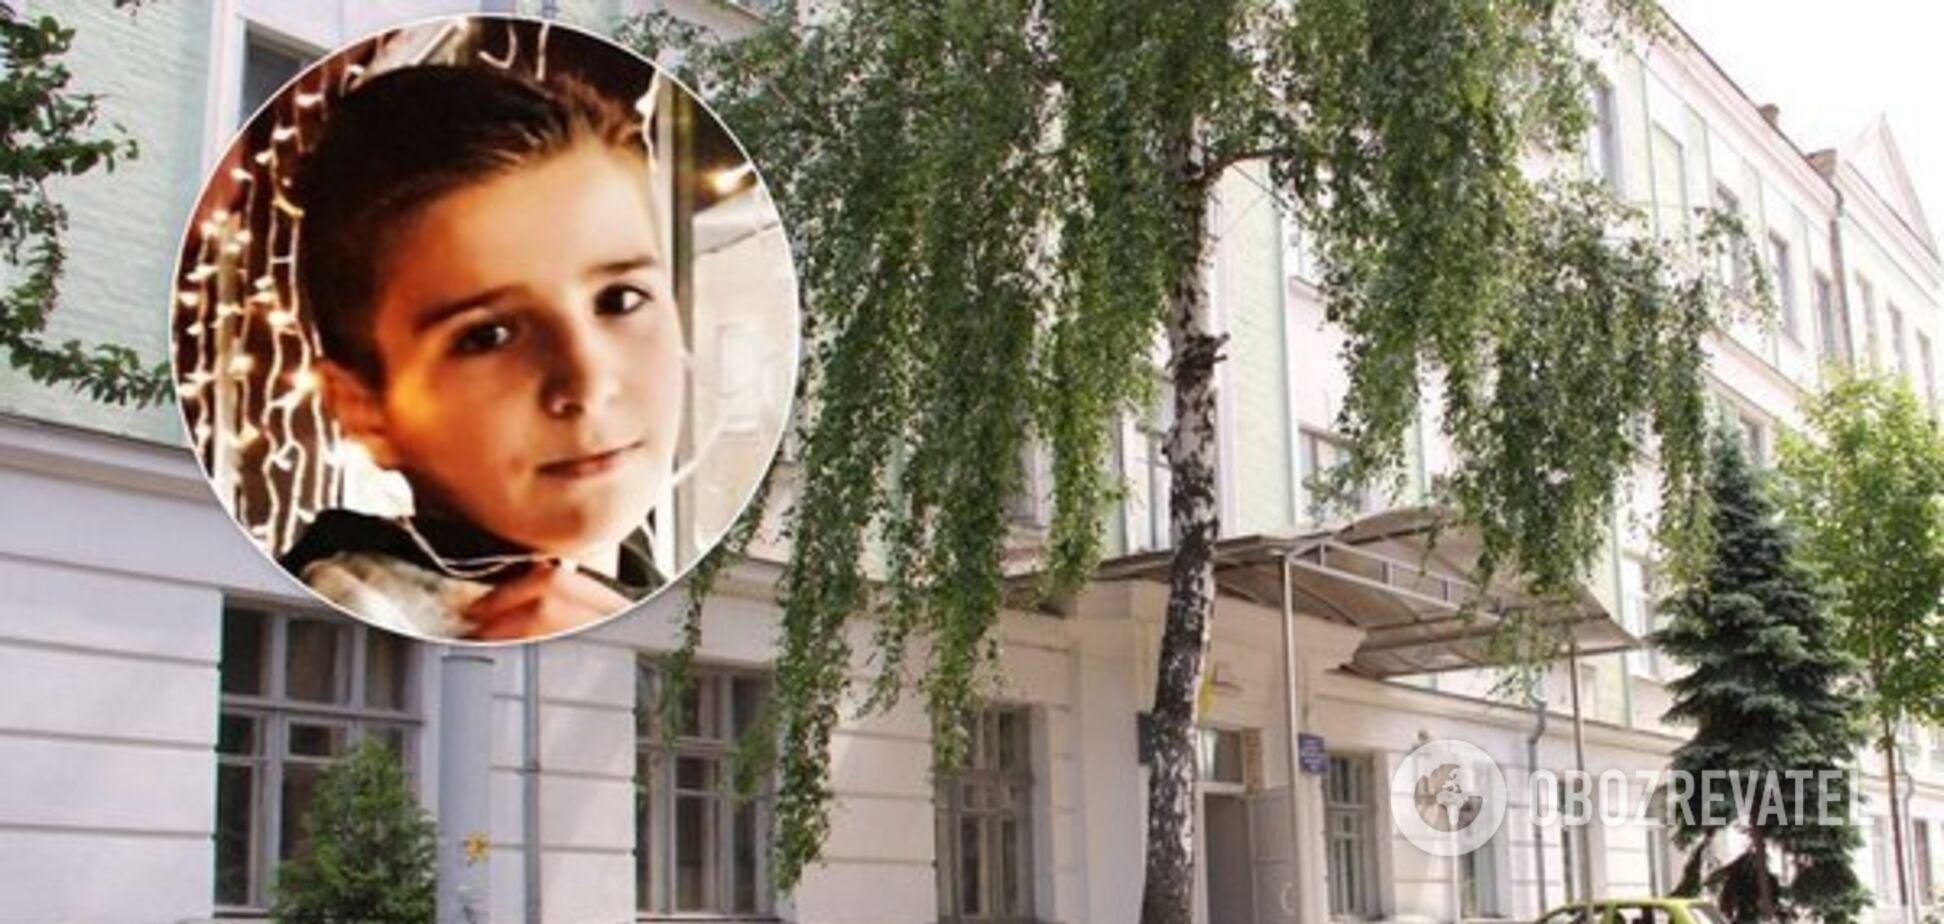 Скандал из-за погибшего ребенка в Киеве: в школе ответили на обвинения